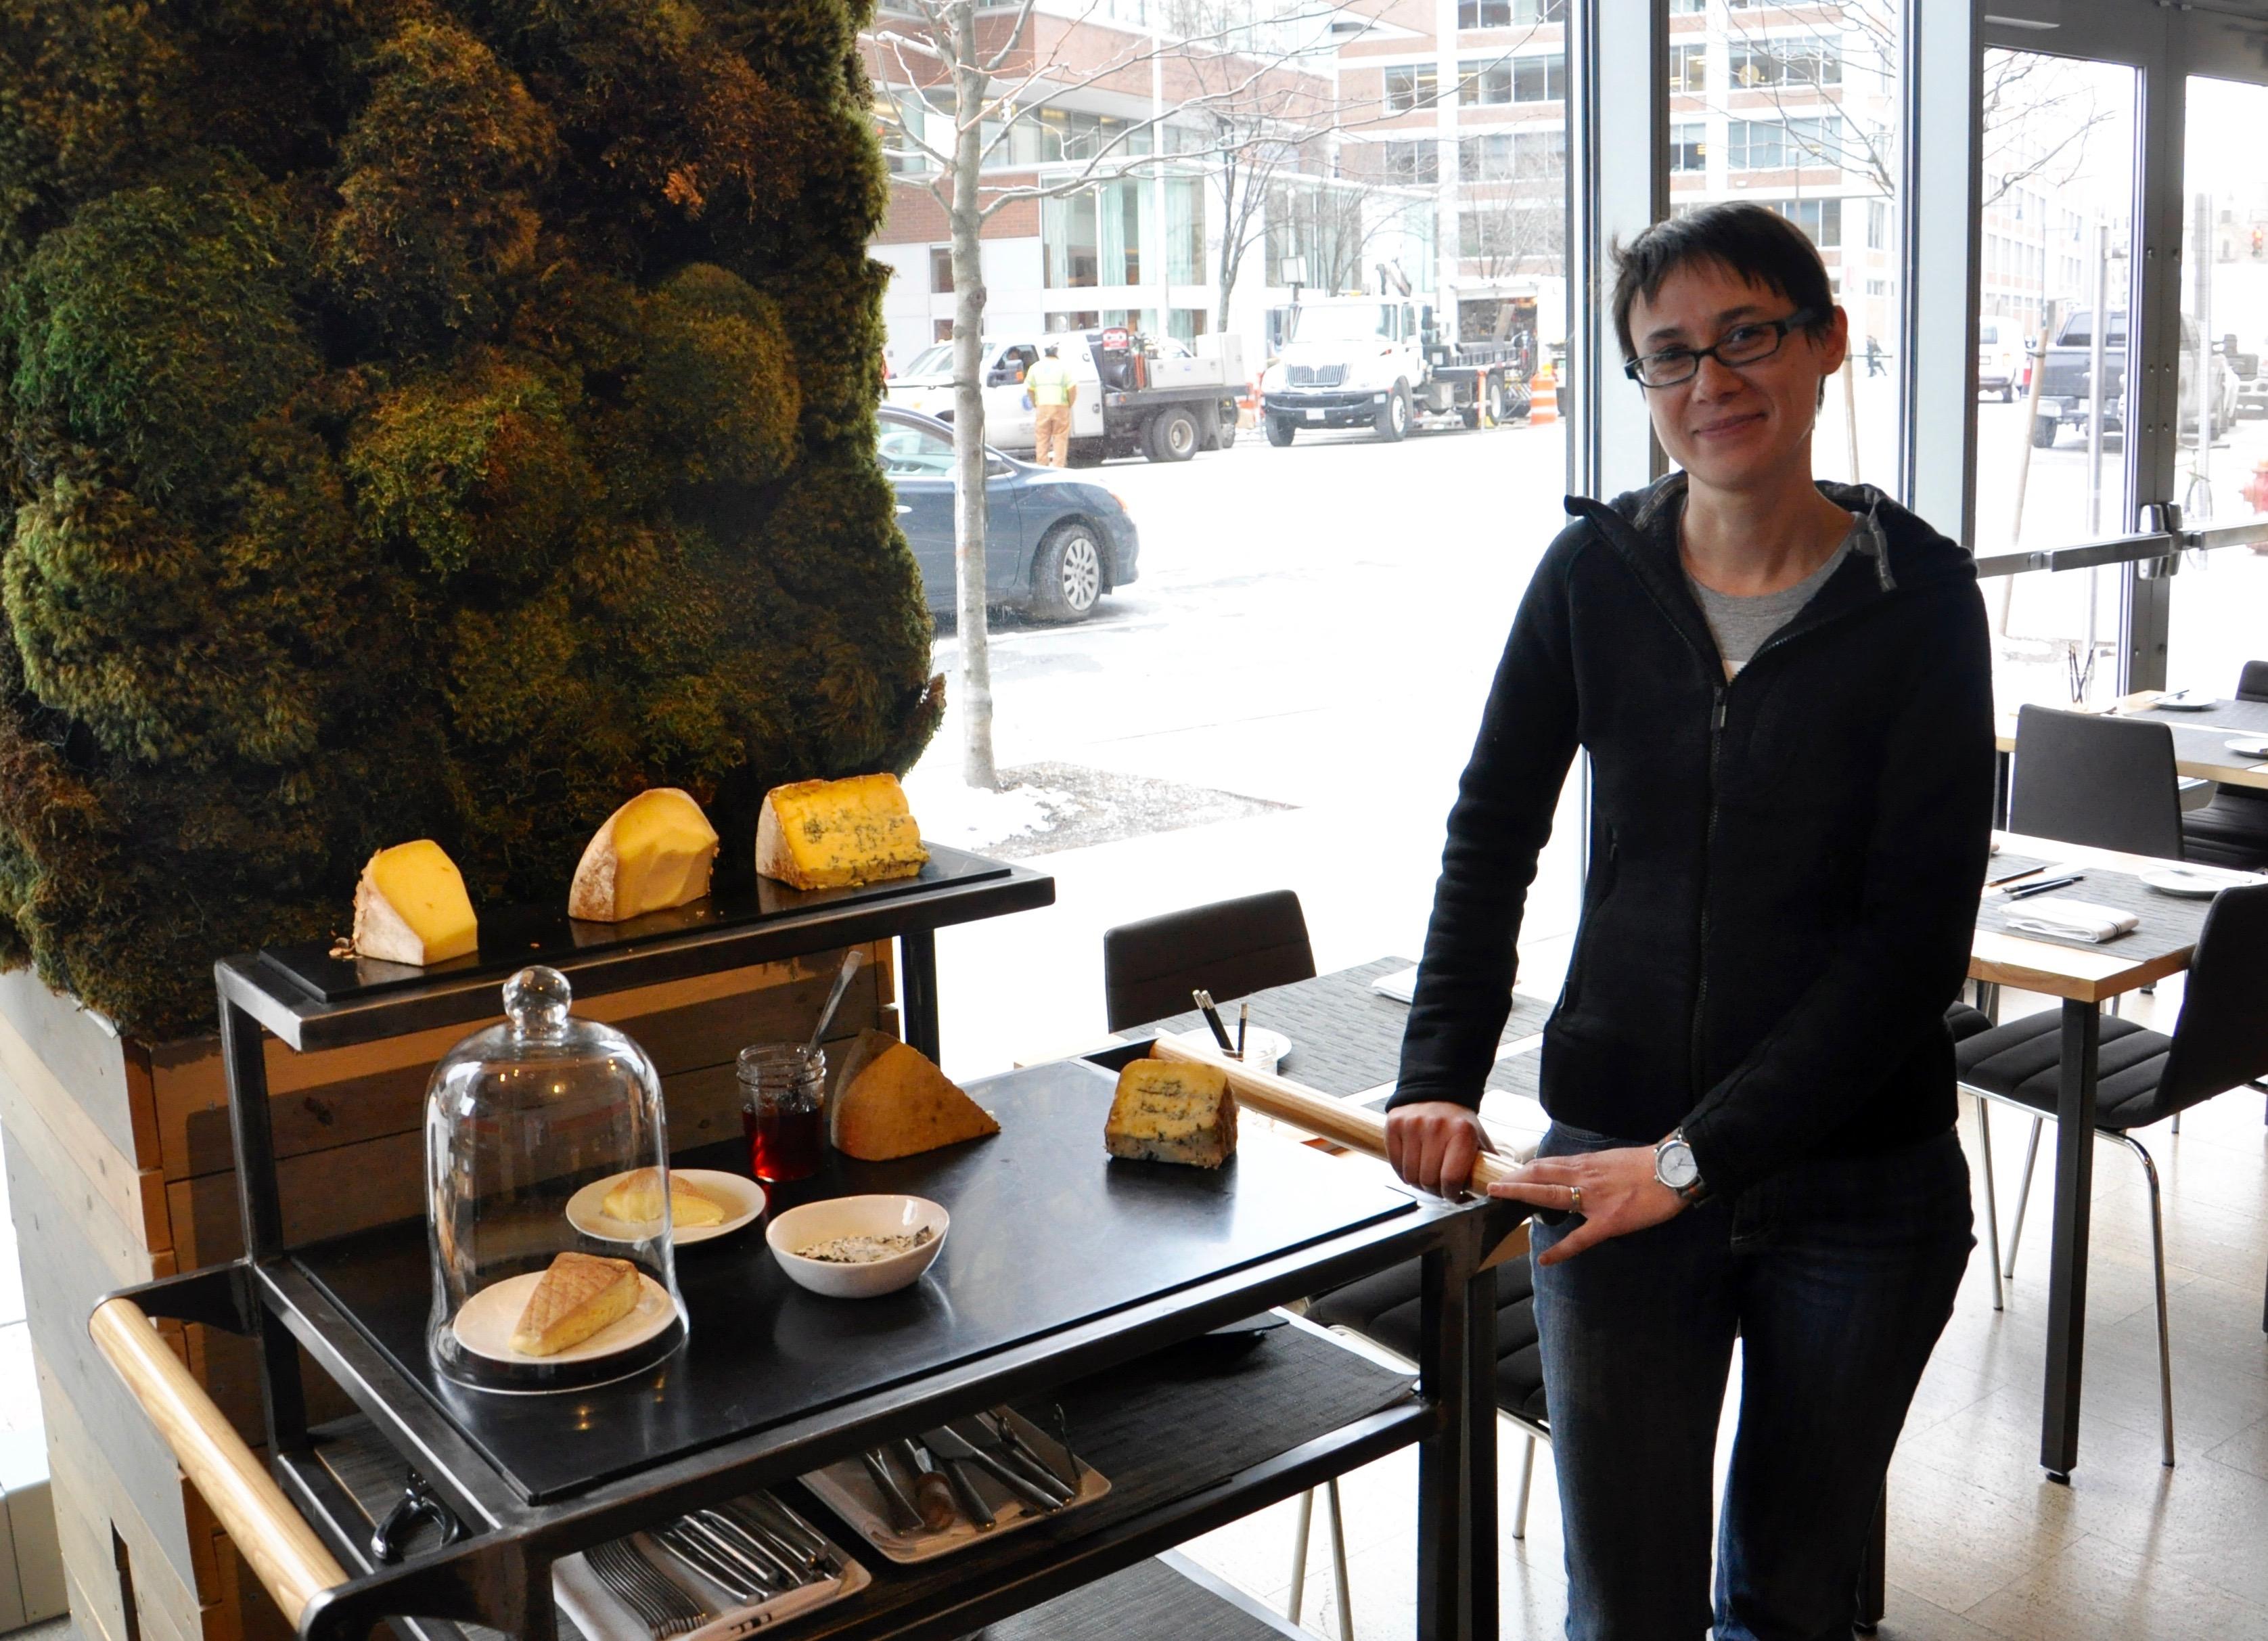 Diana Kudajarova with the cheese cart at Study